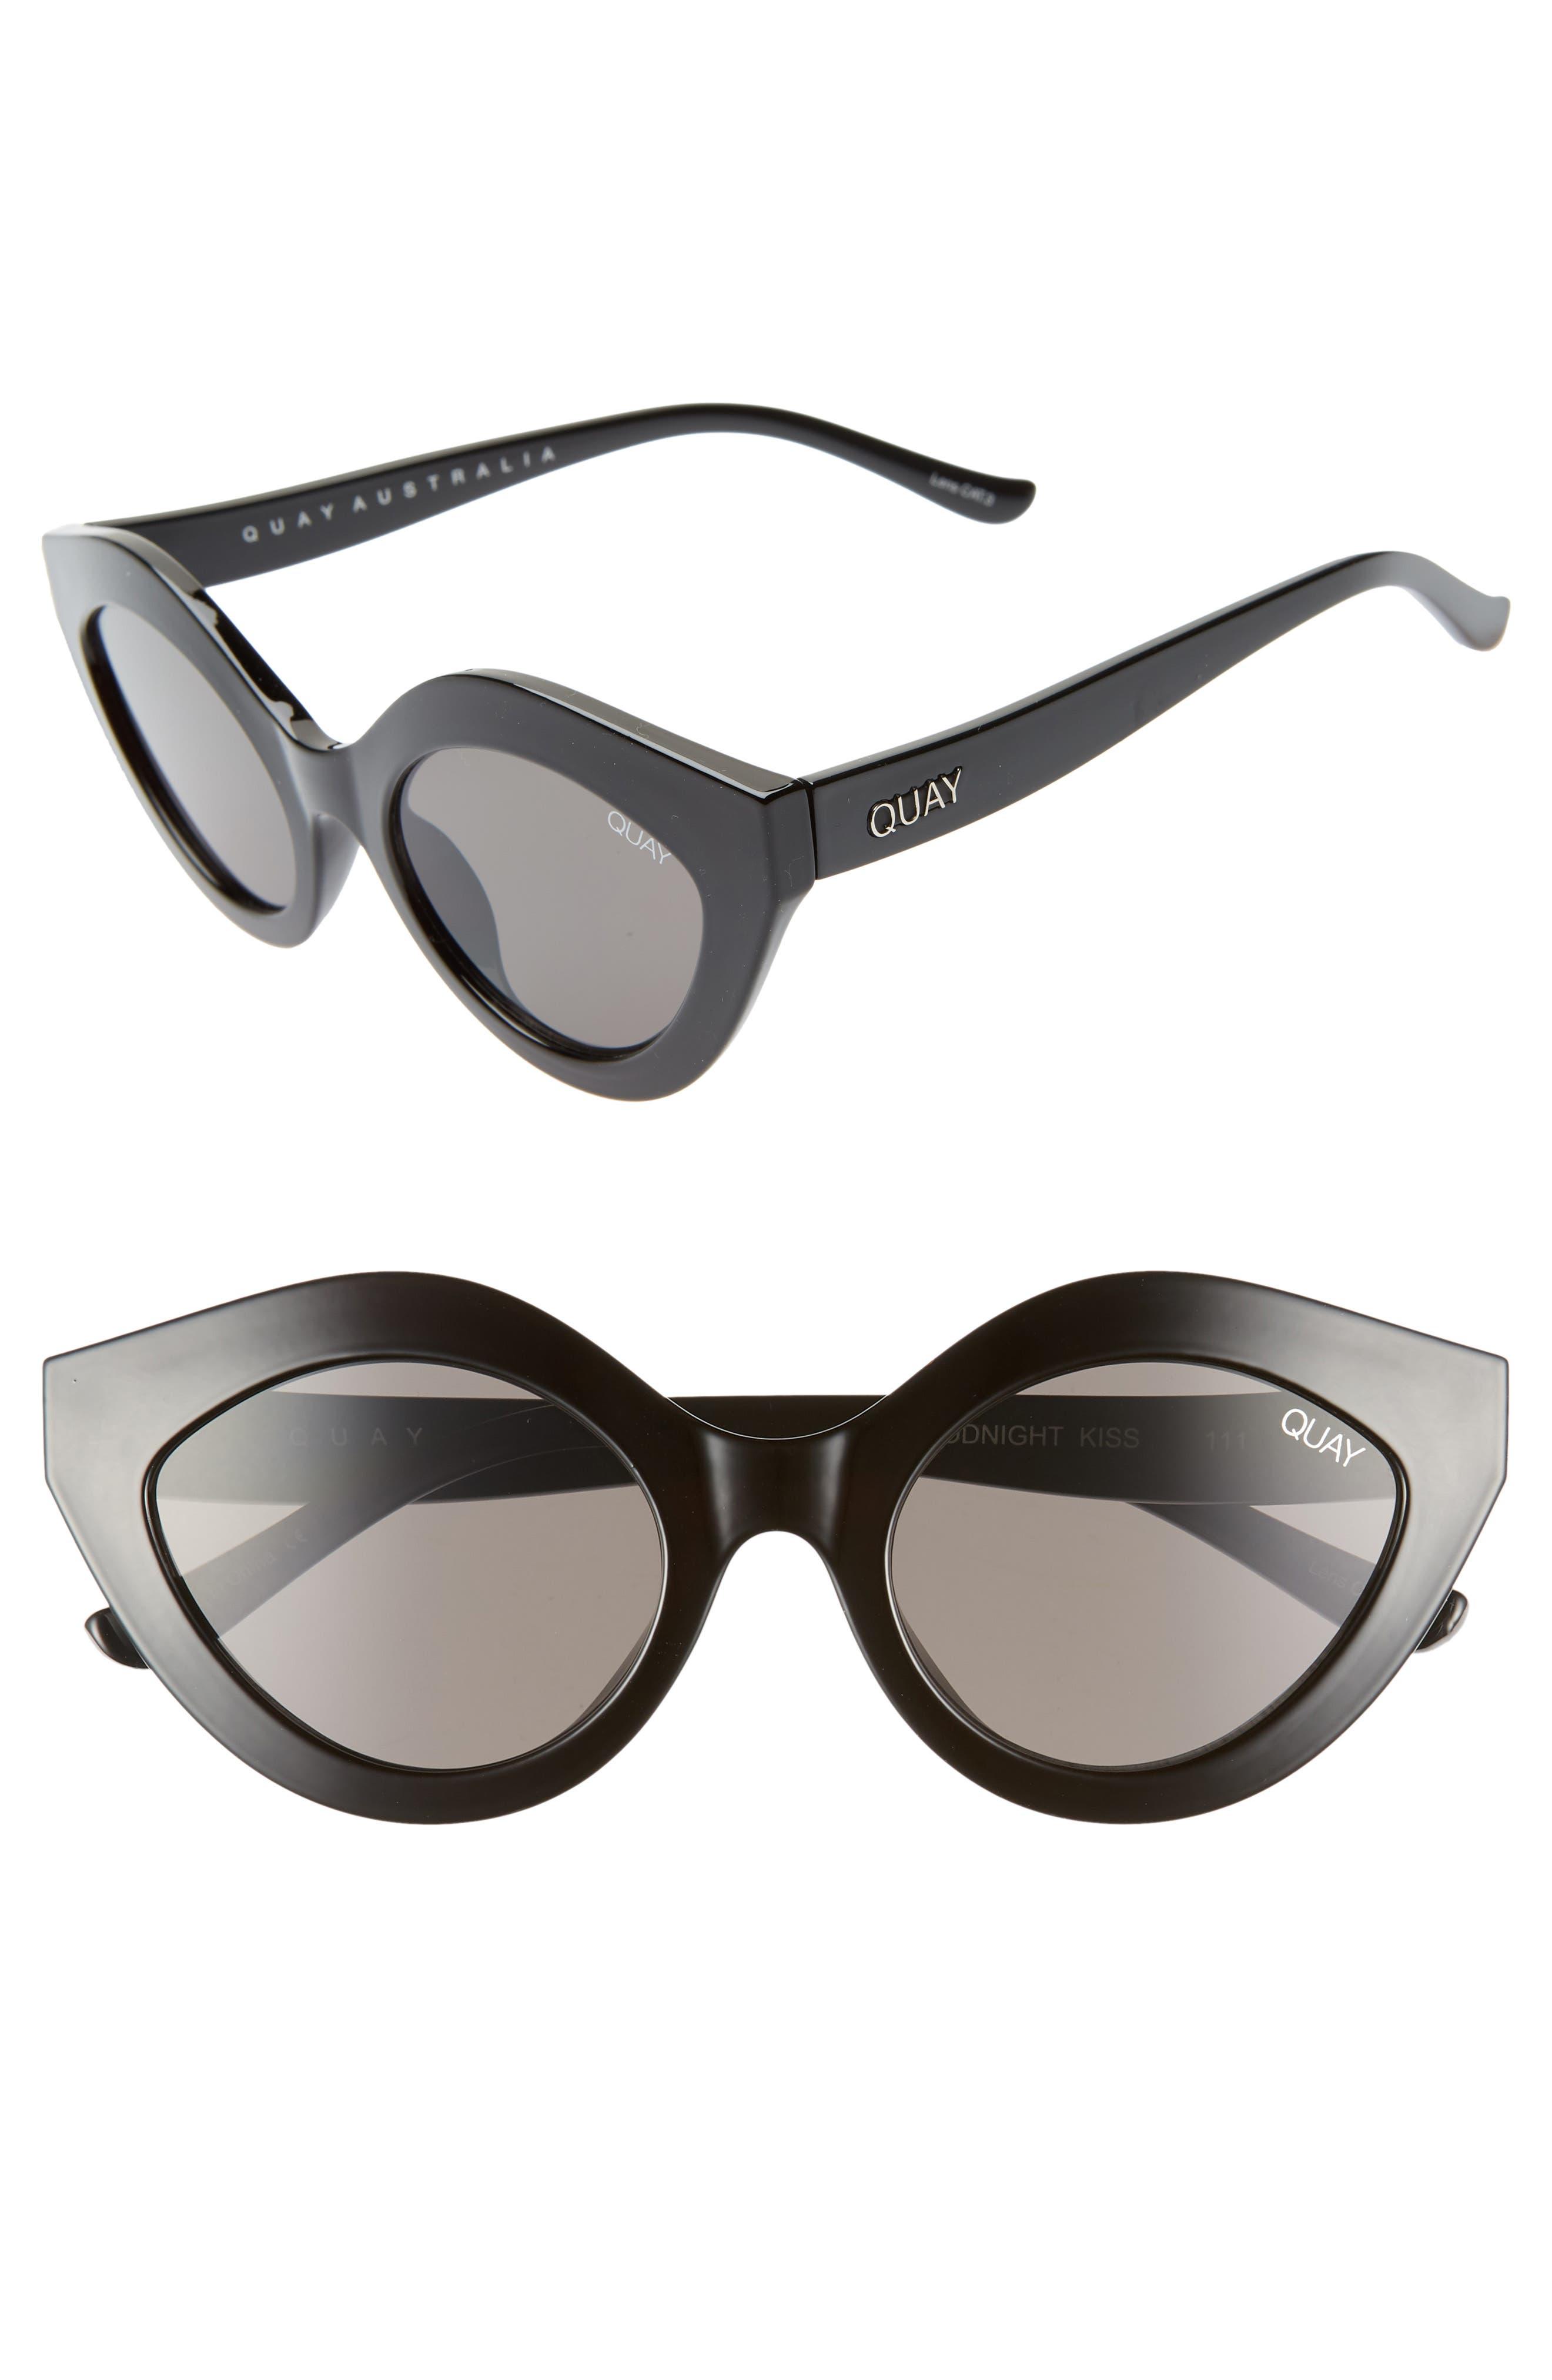 QUAY AUSTRALIA Goodnight Kiss Cat Eye Sunglasses, Main, color, BLACK / SMOKE